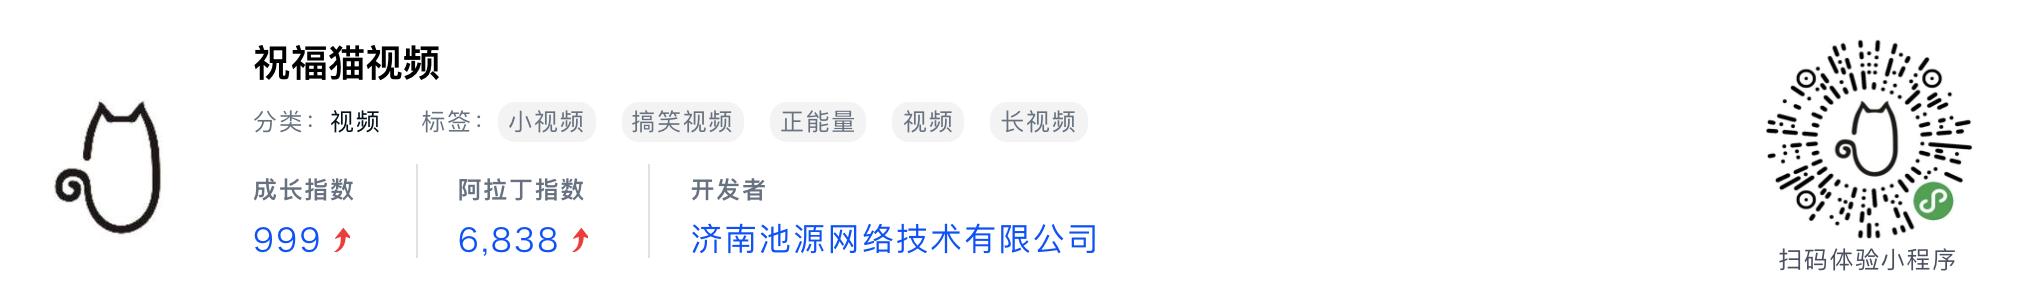 WeChatミニプログラム最新ランキングTOP20【2019年6月版】6位:祝福猫视频